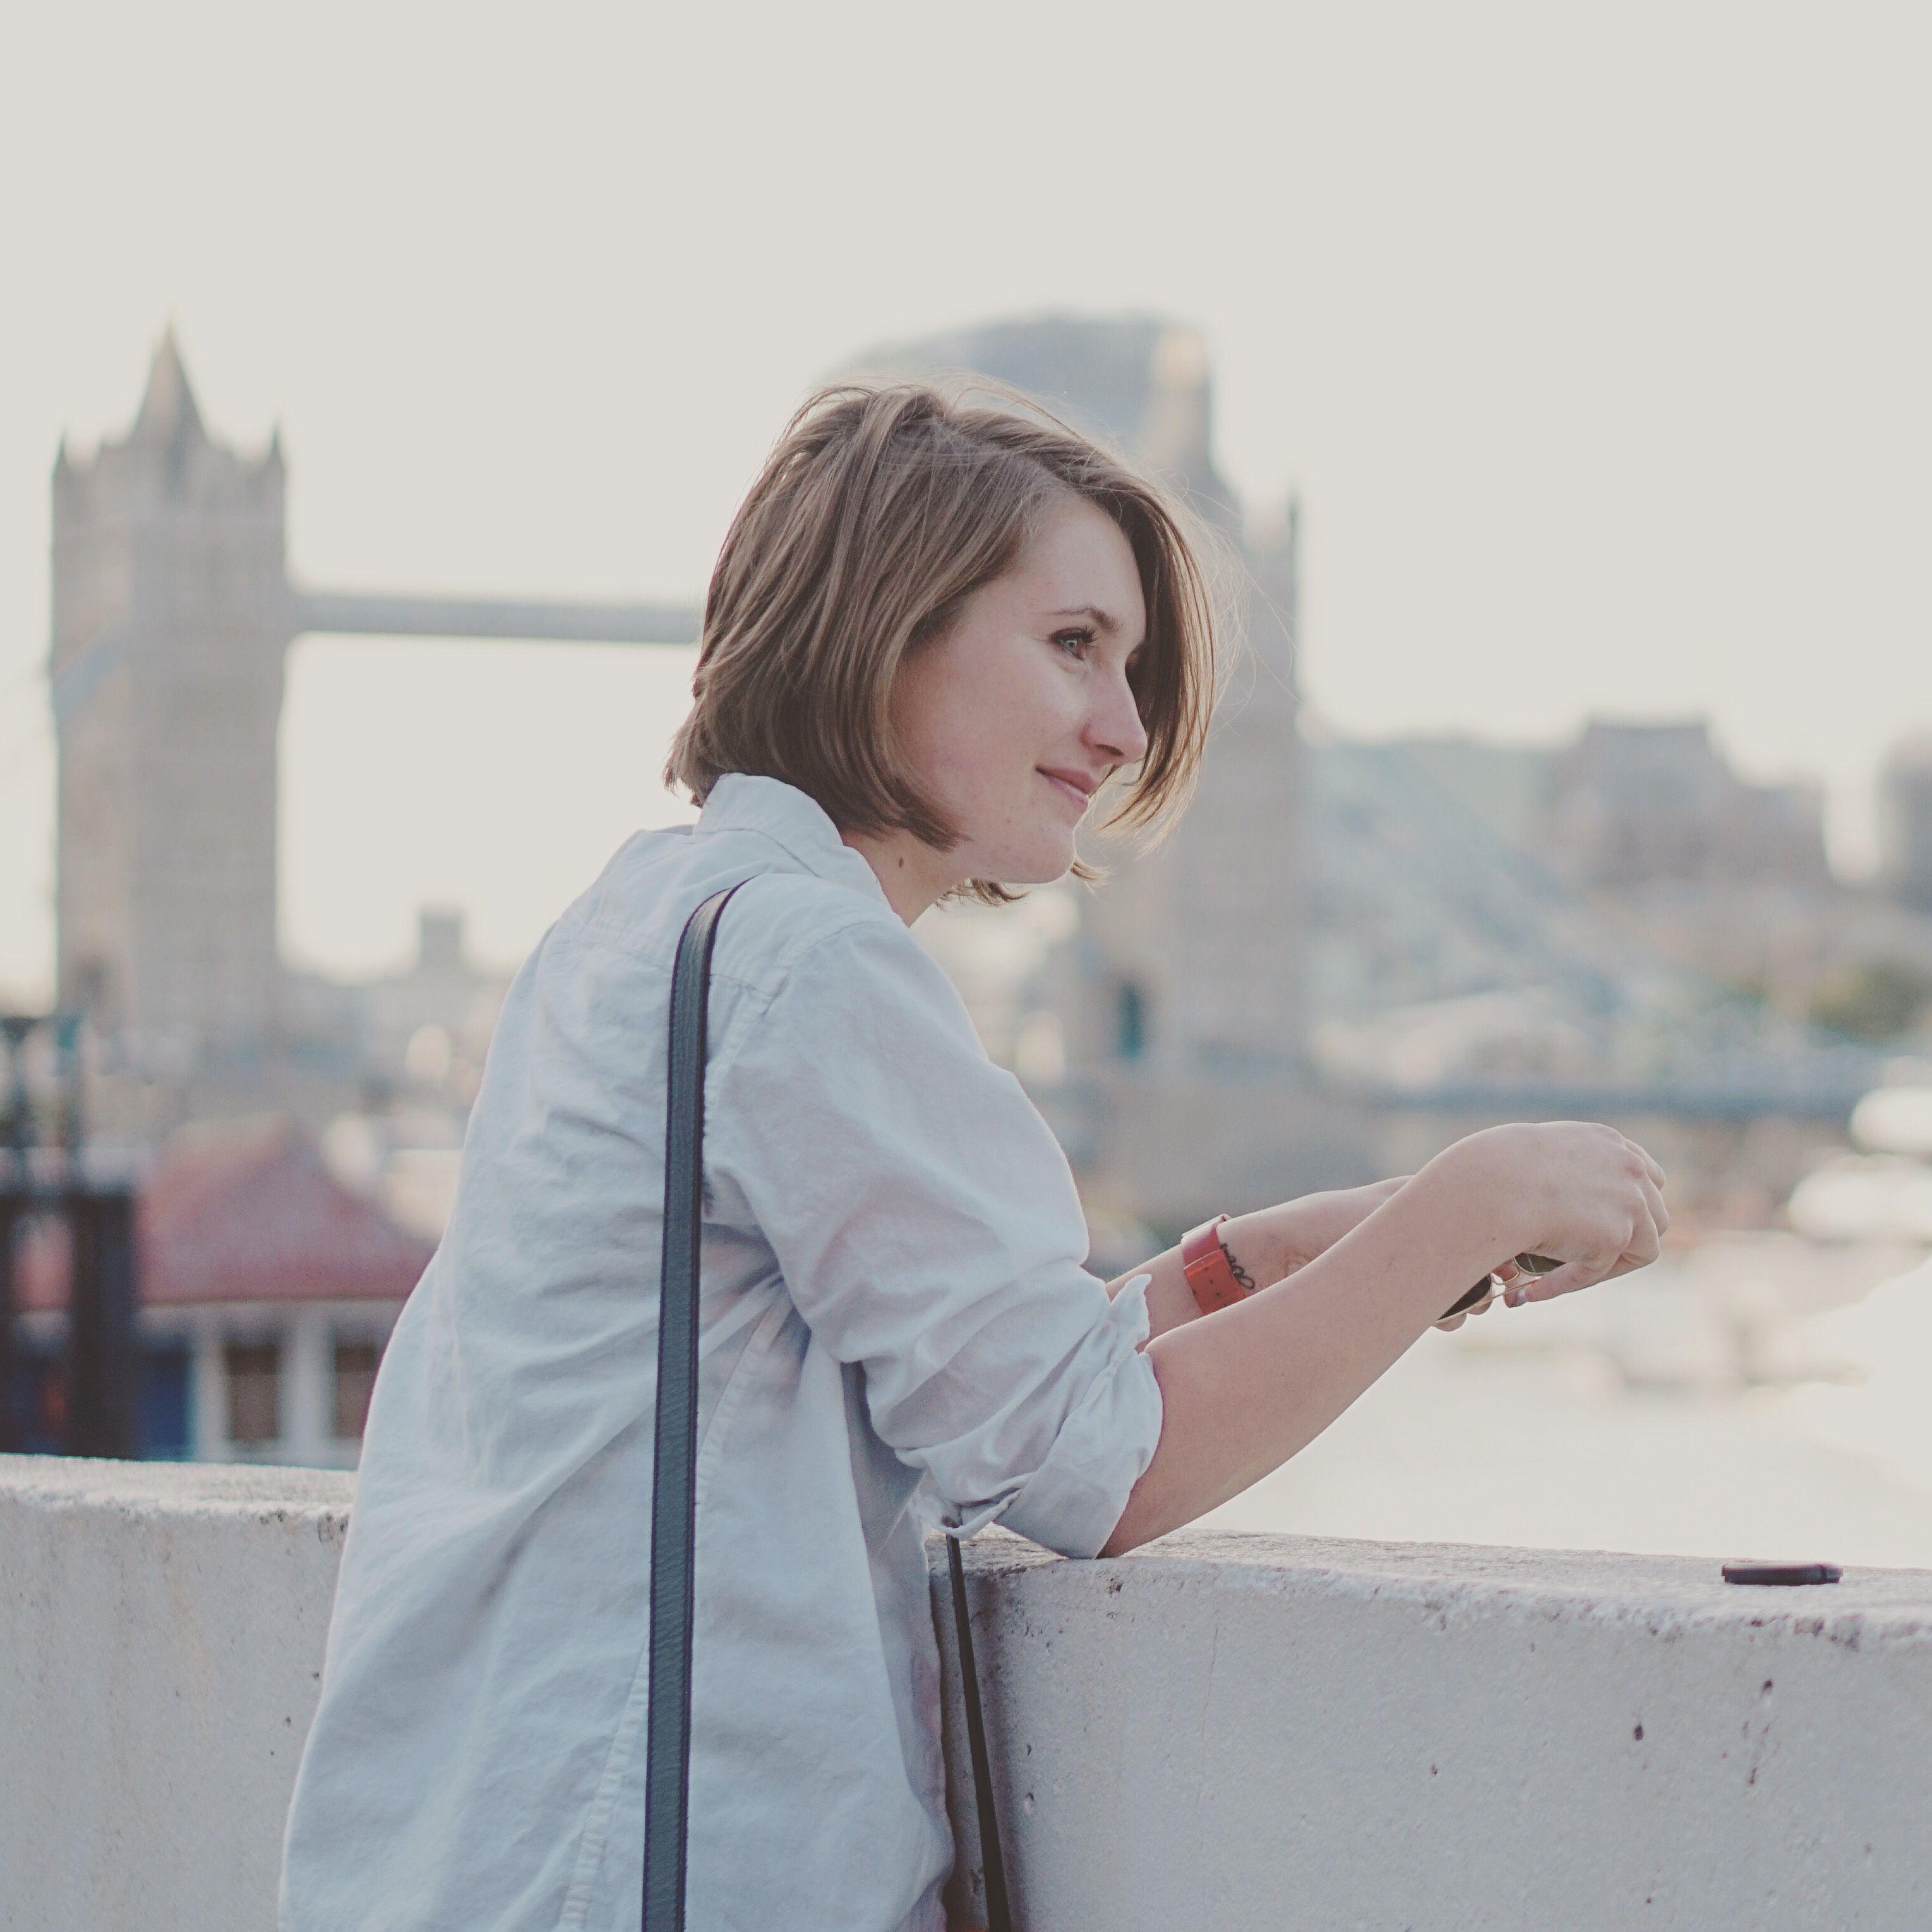 Ioana at Tower Bridge